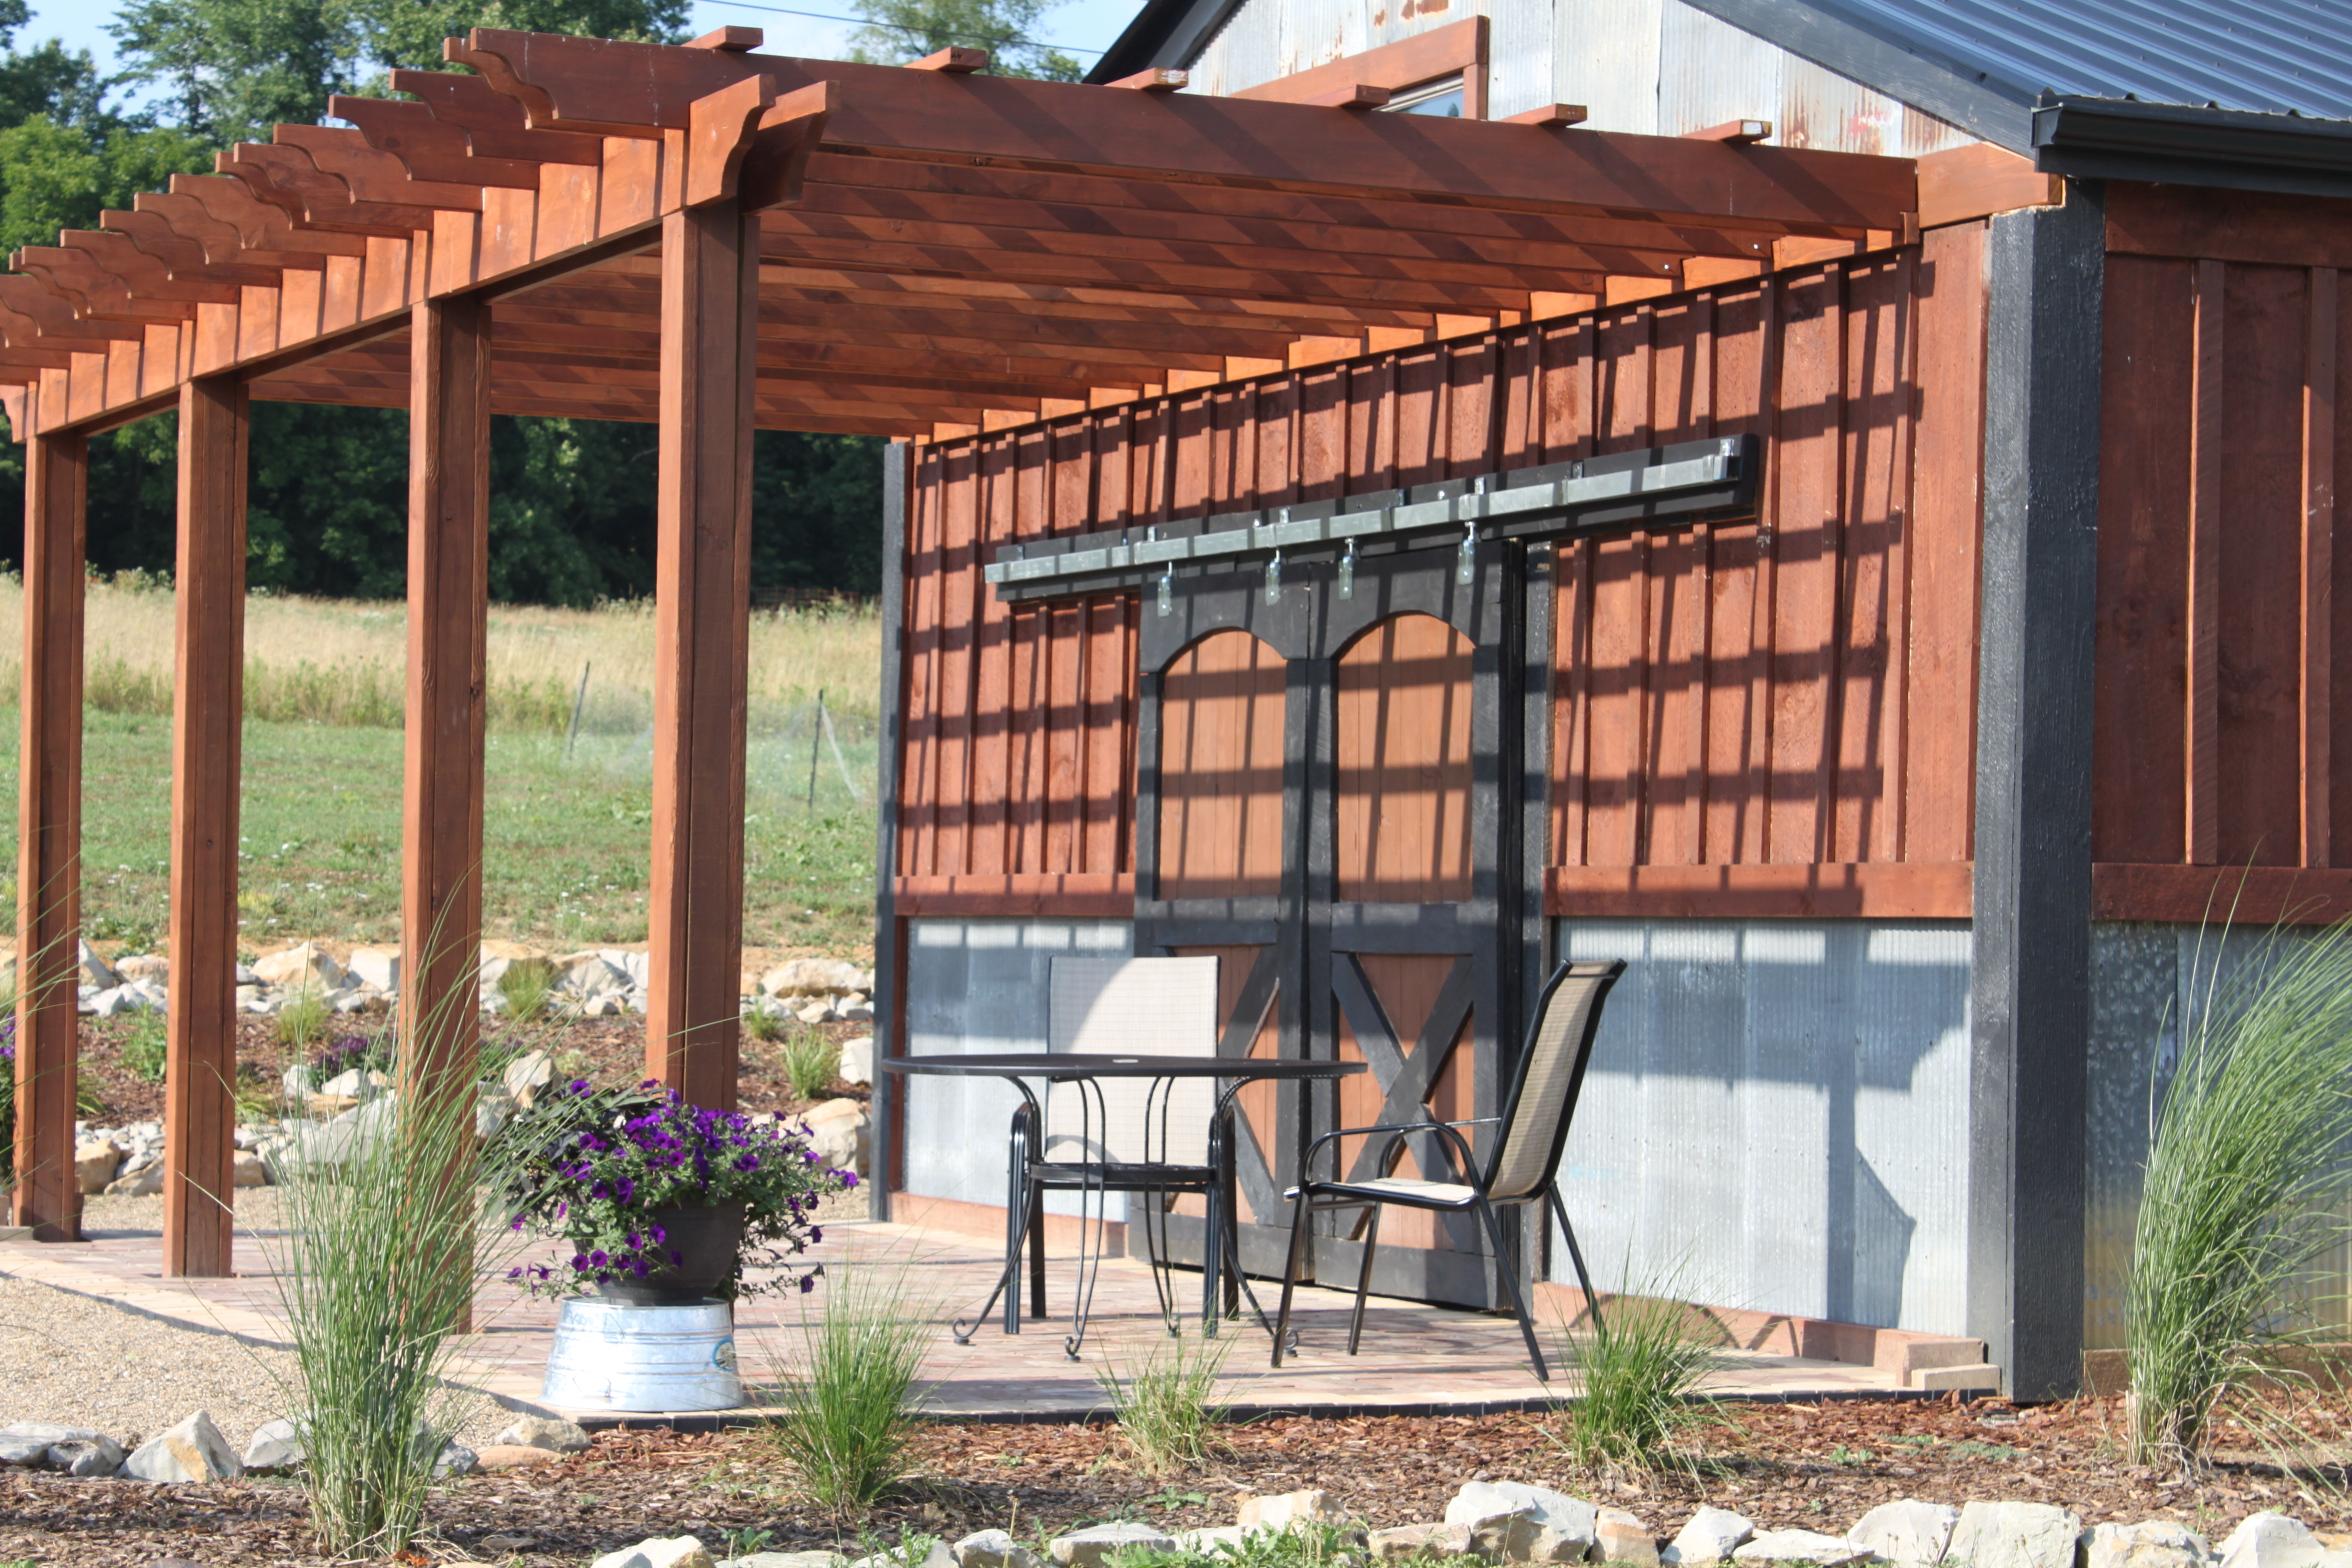 Creating Your Own Outdoor Paradise | Old World Garden Farms